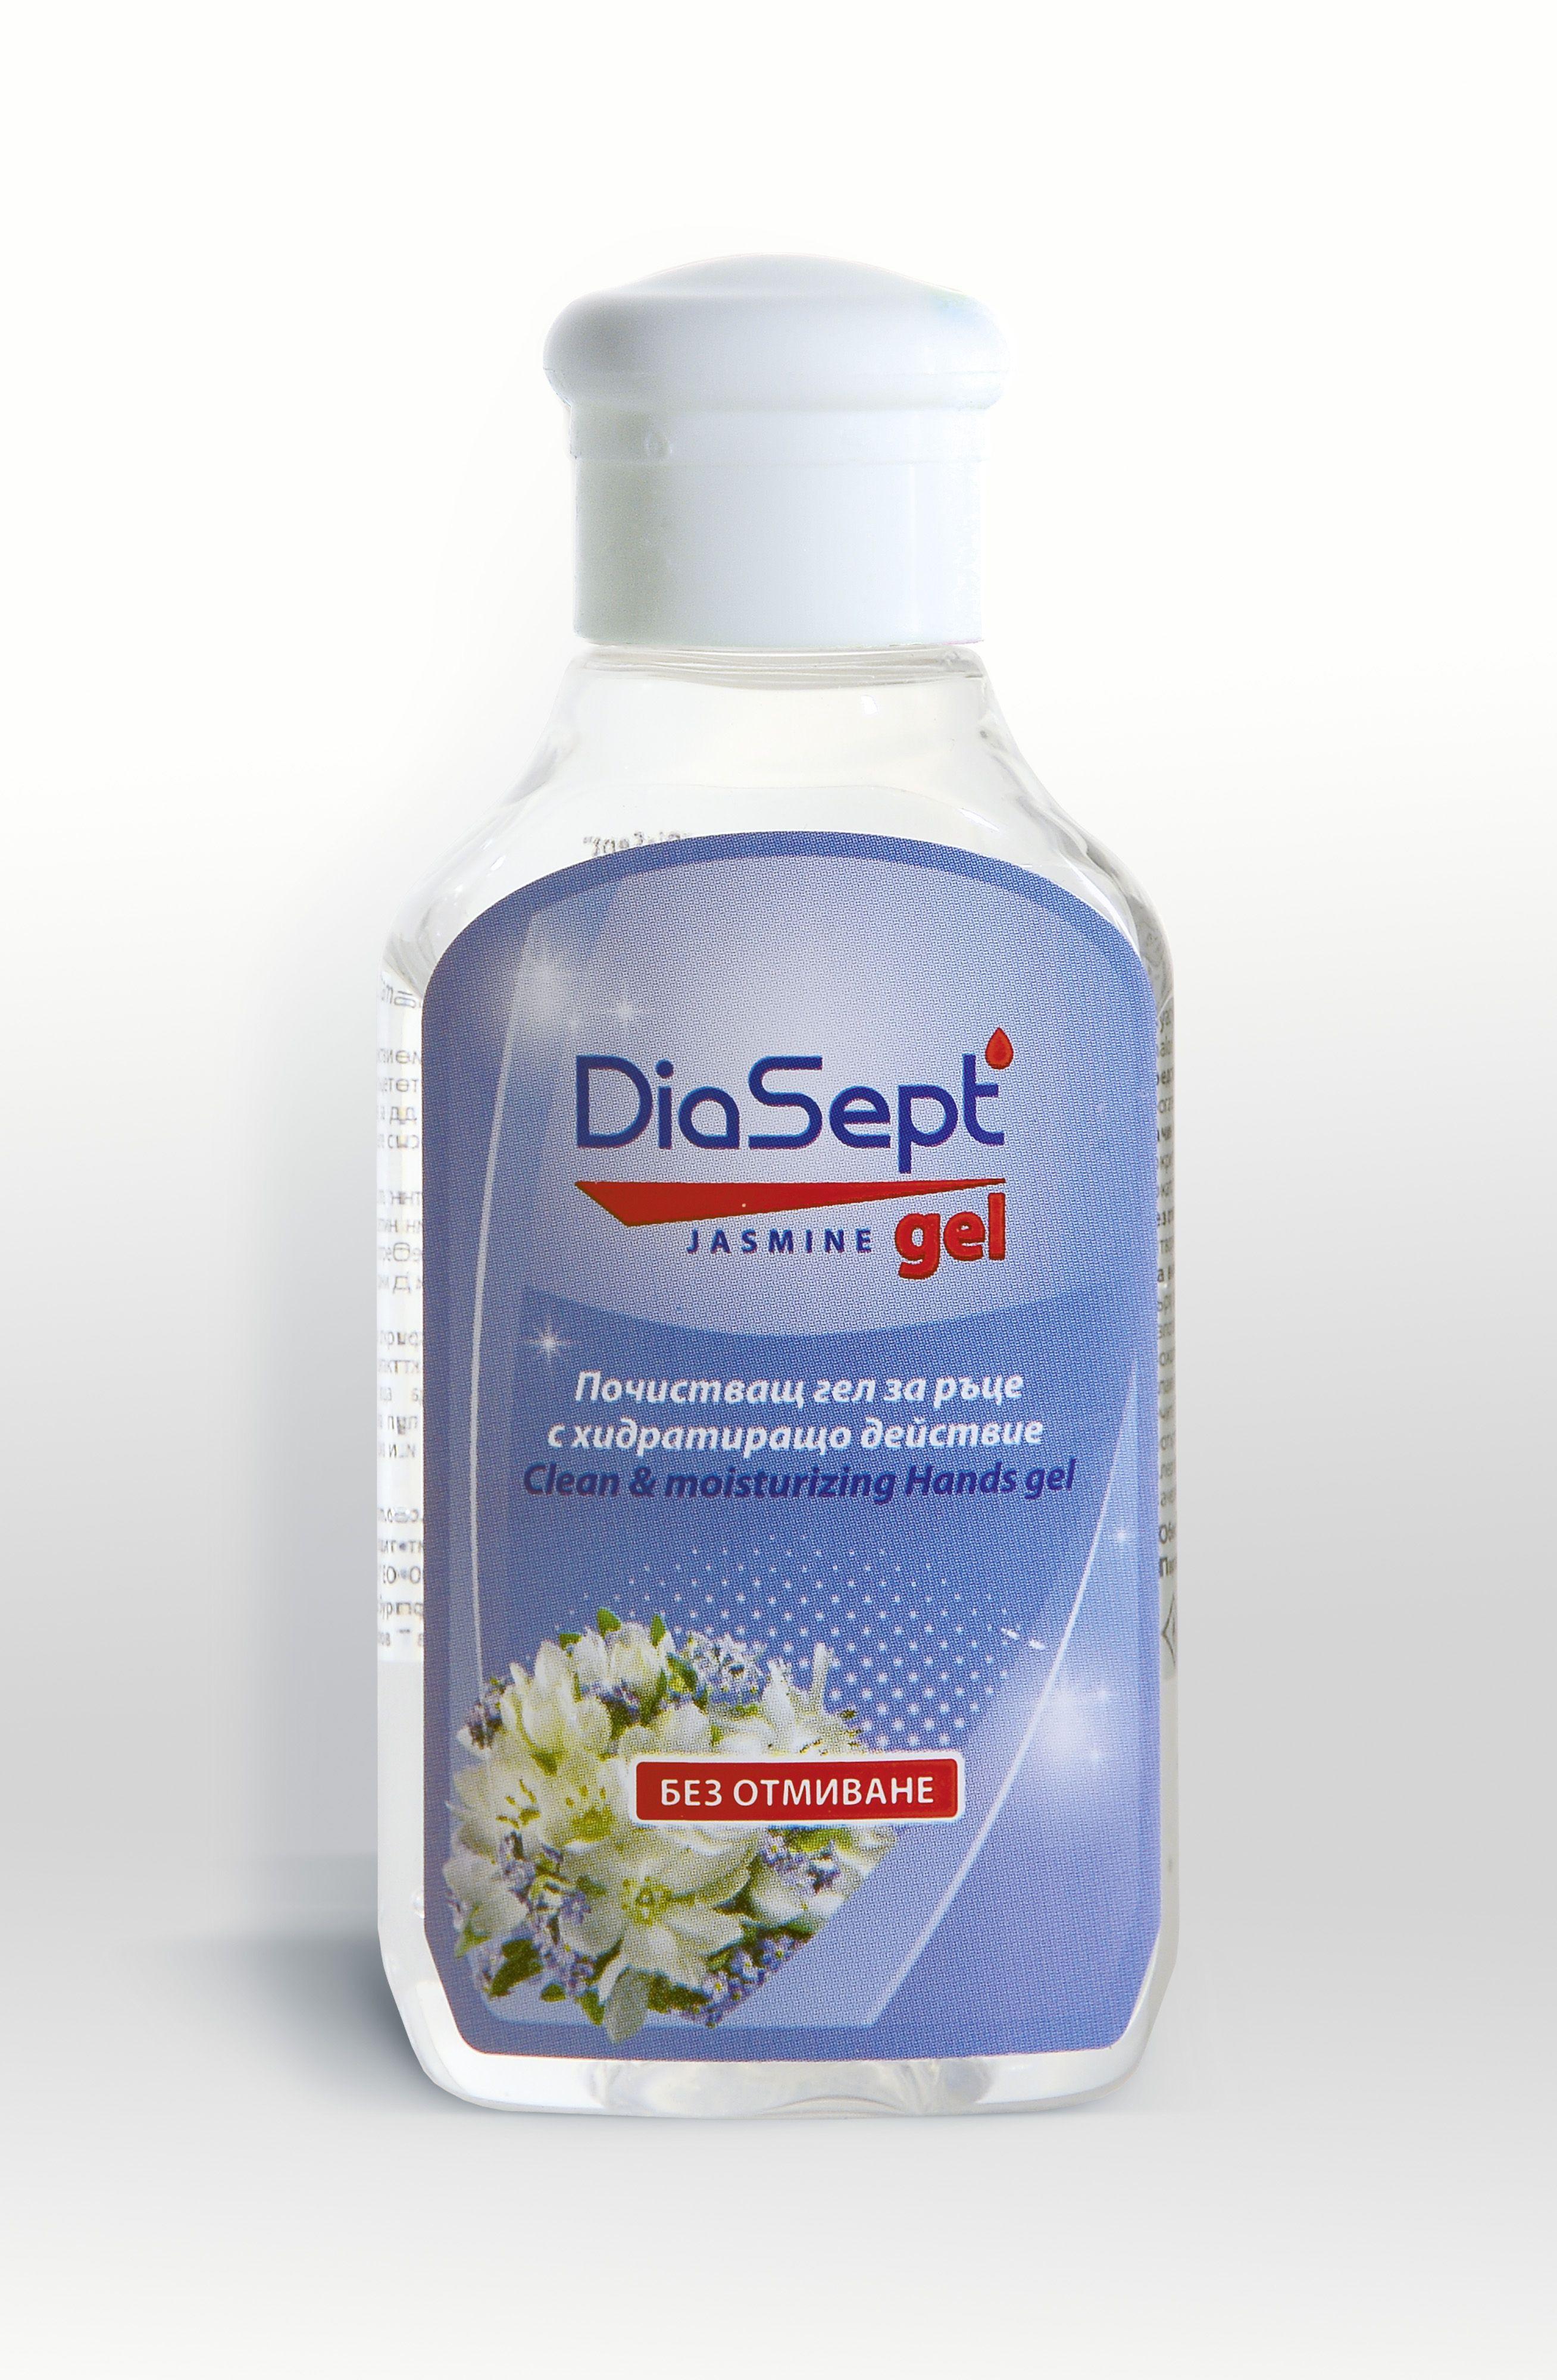 DiaSept Jasmine 50ml Antiseptic 99.9% efficient 70% alcohol